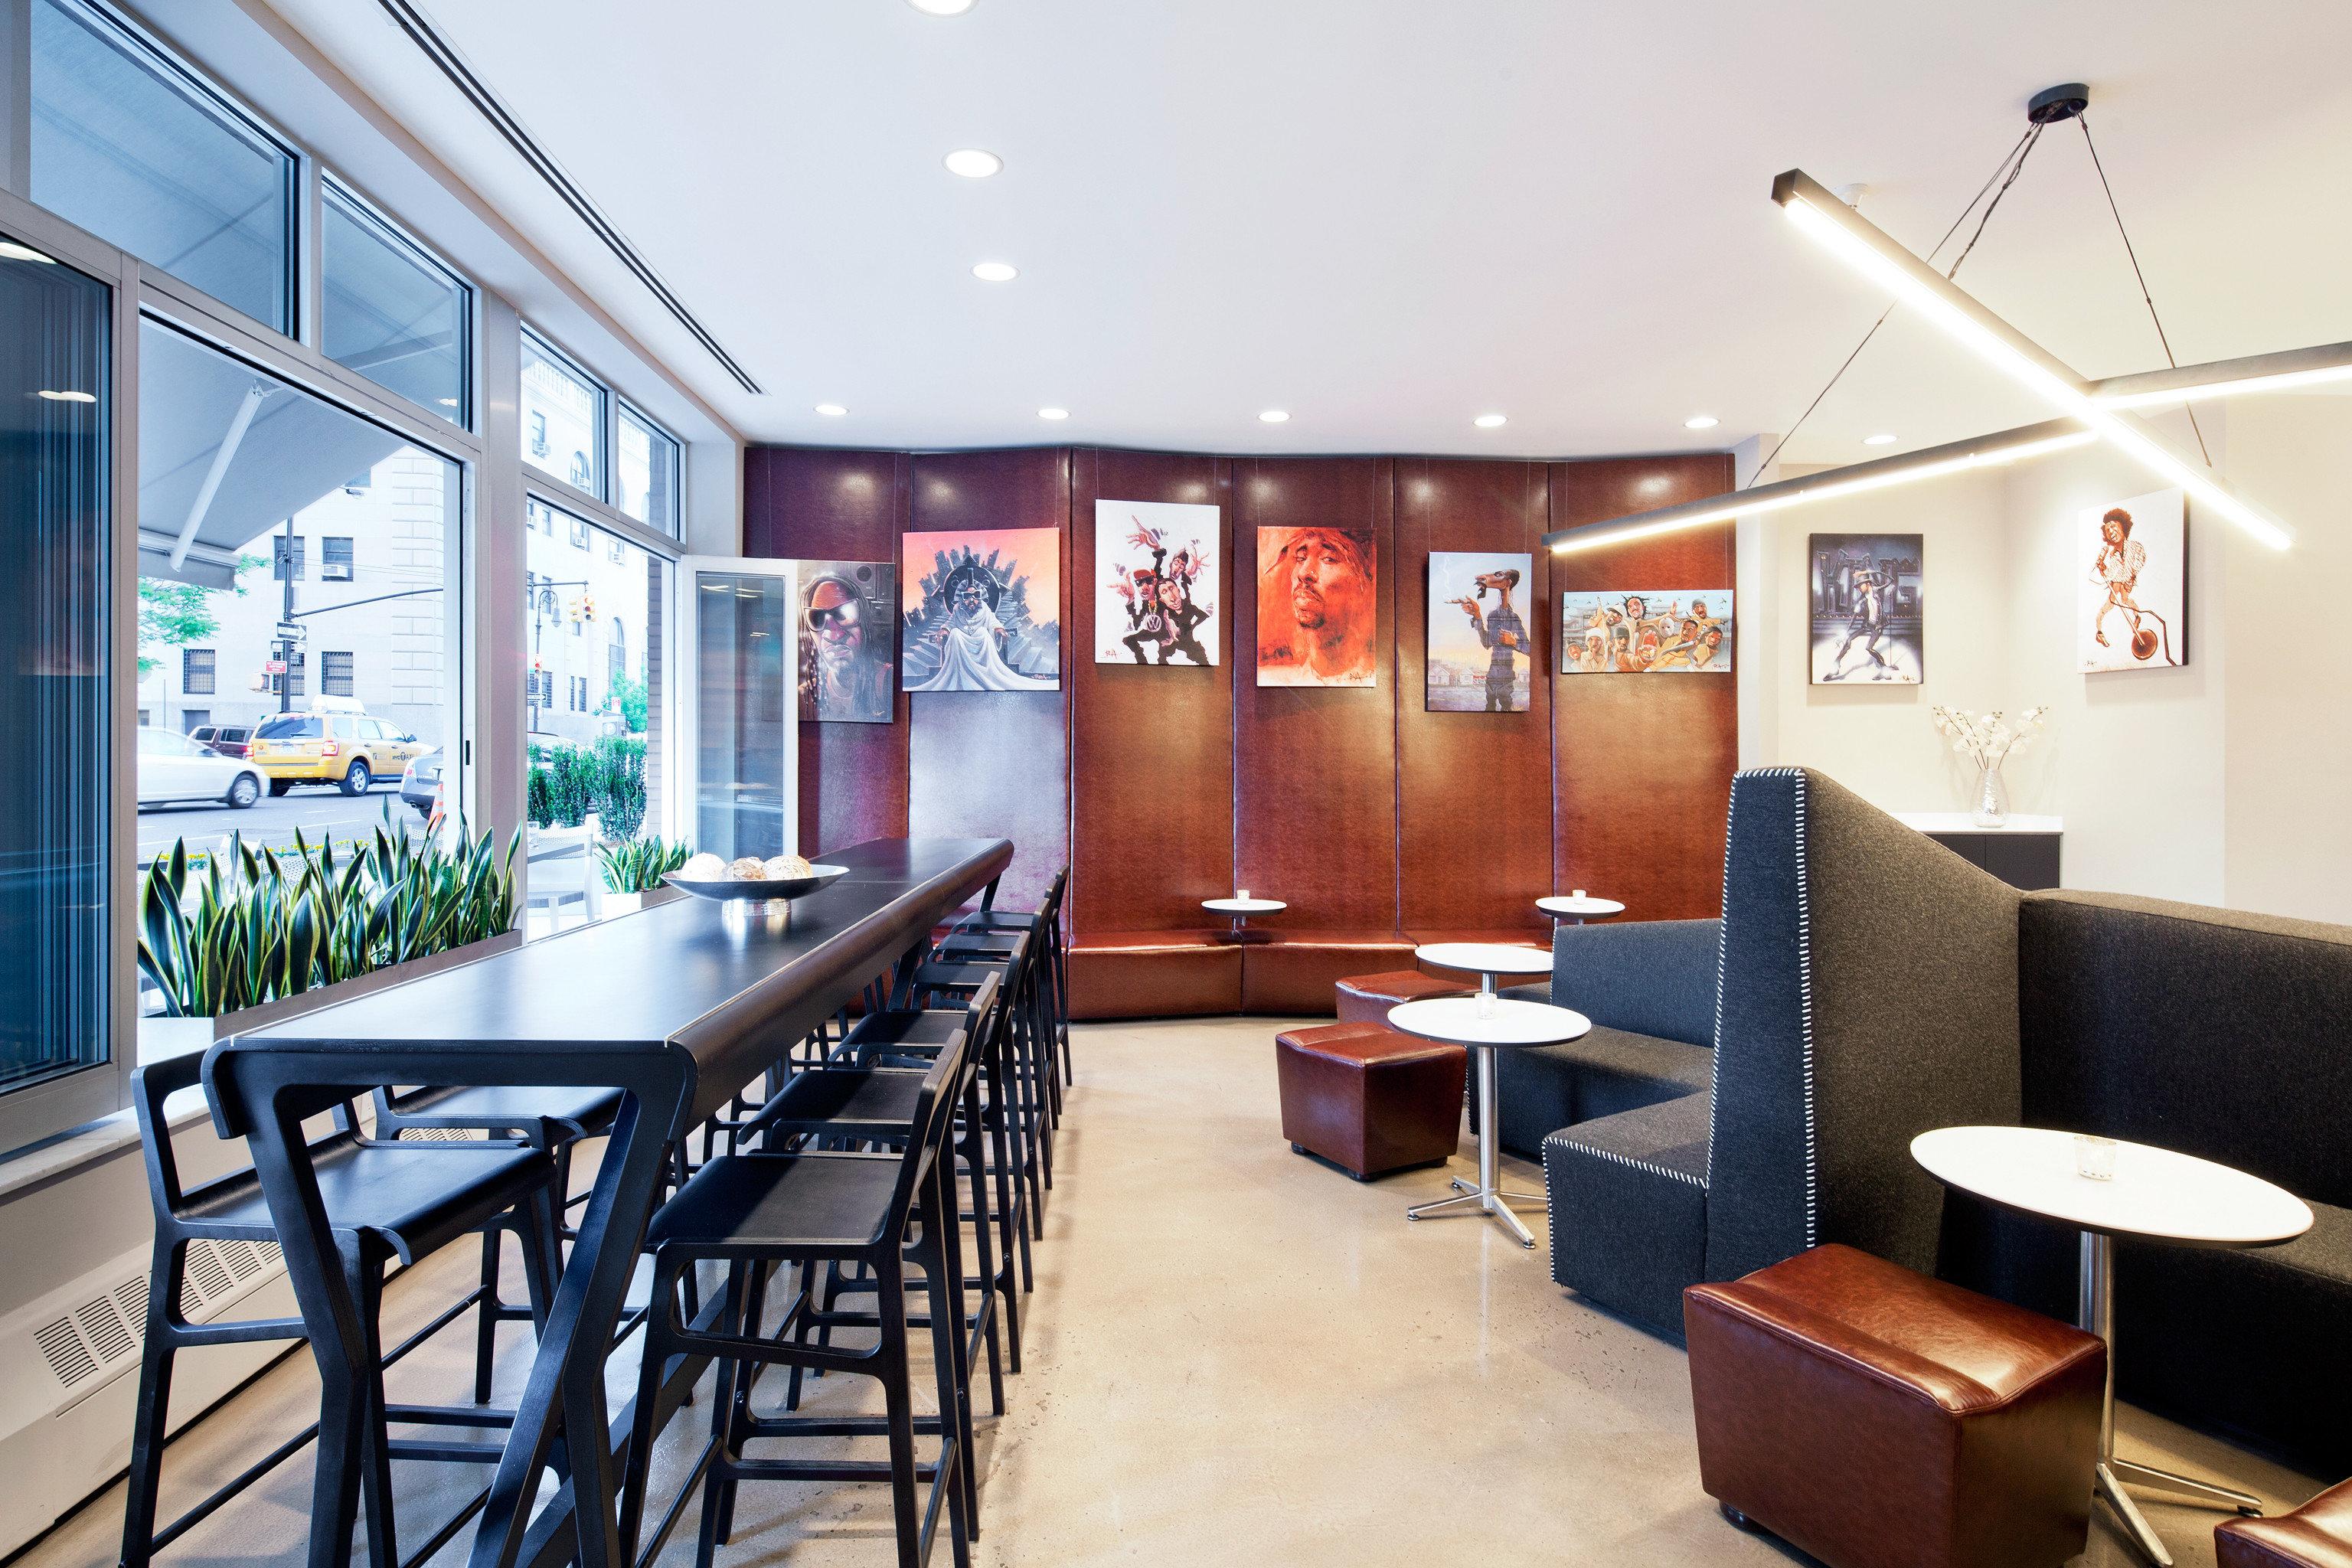 Budget City Dining Eat Lounge chair property restaurant Lobby Bar café condominium Modern